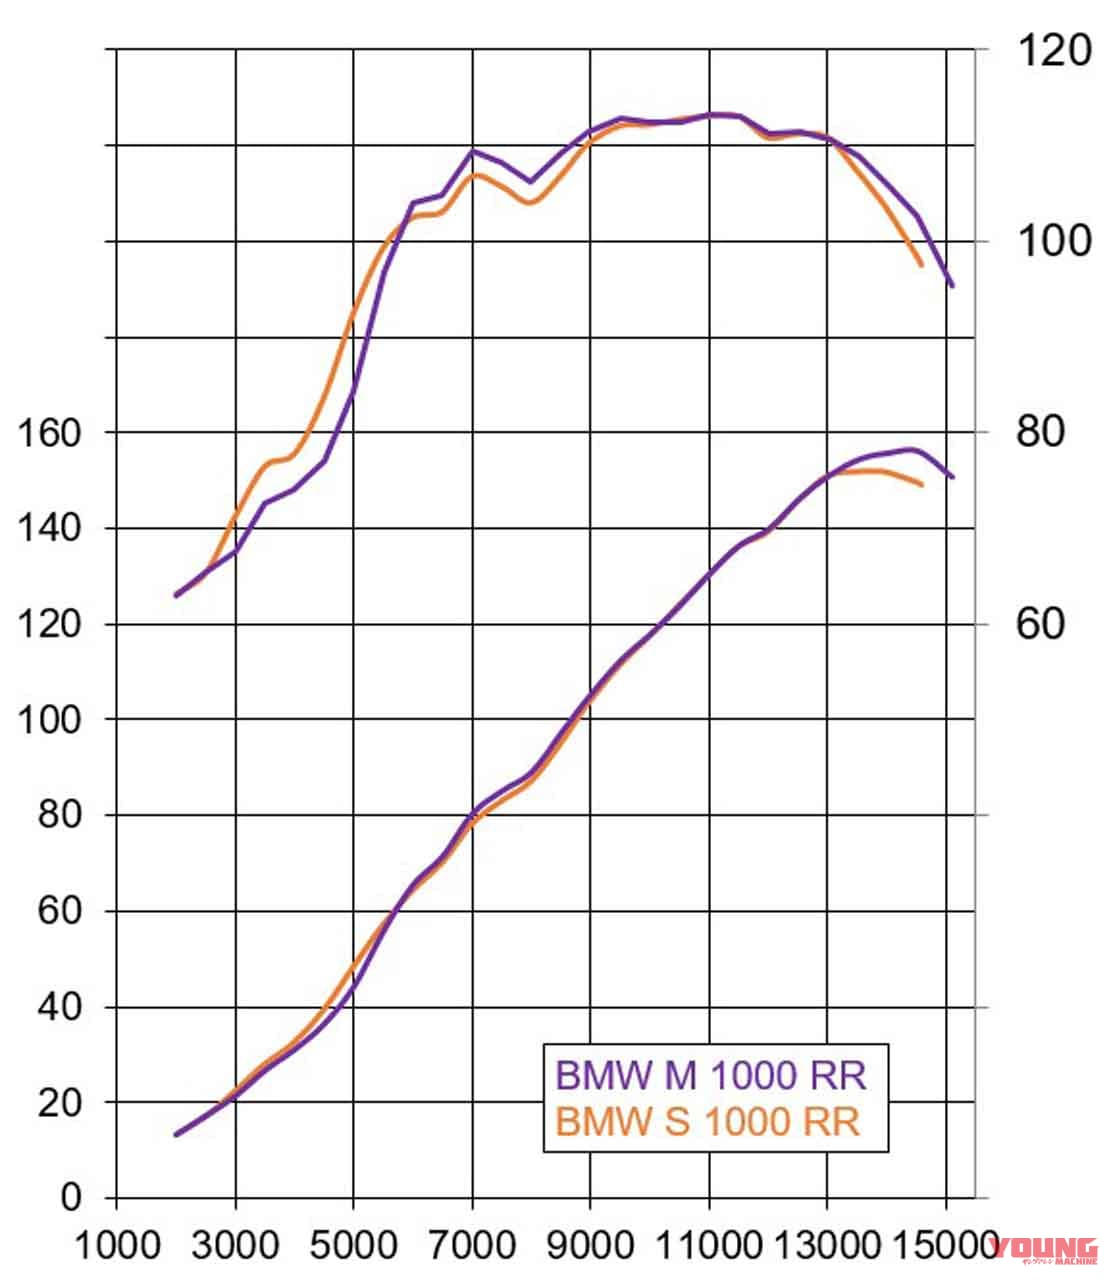 bmw-m1000rr